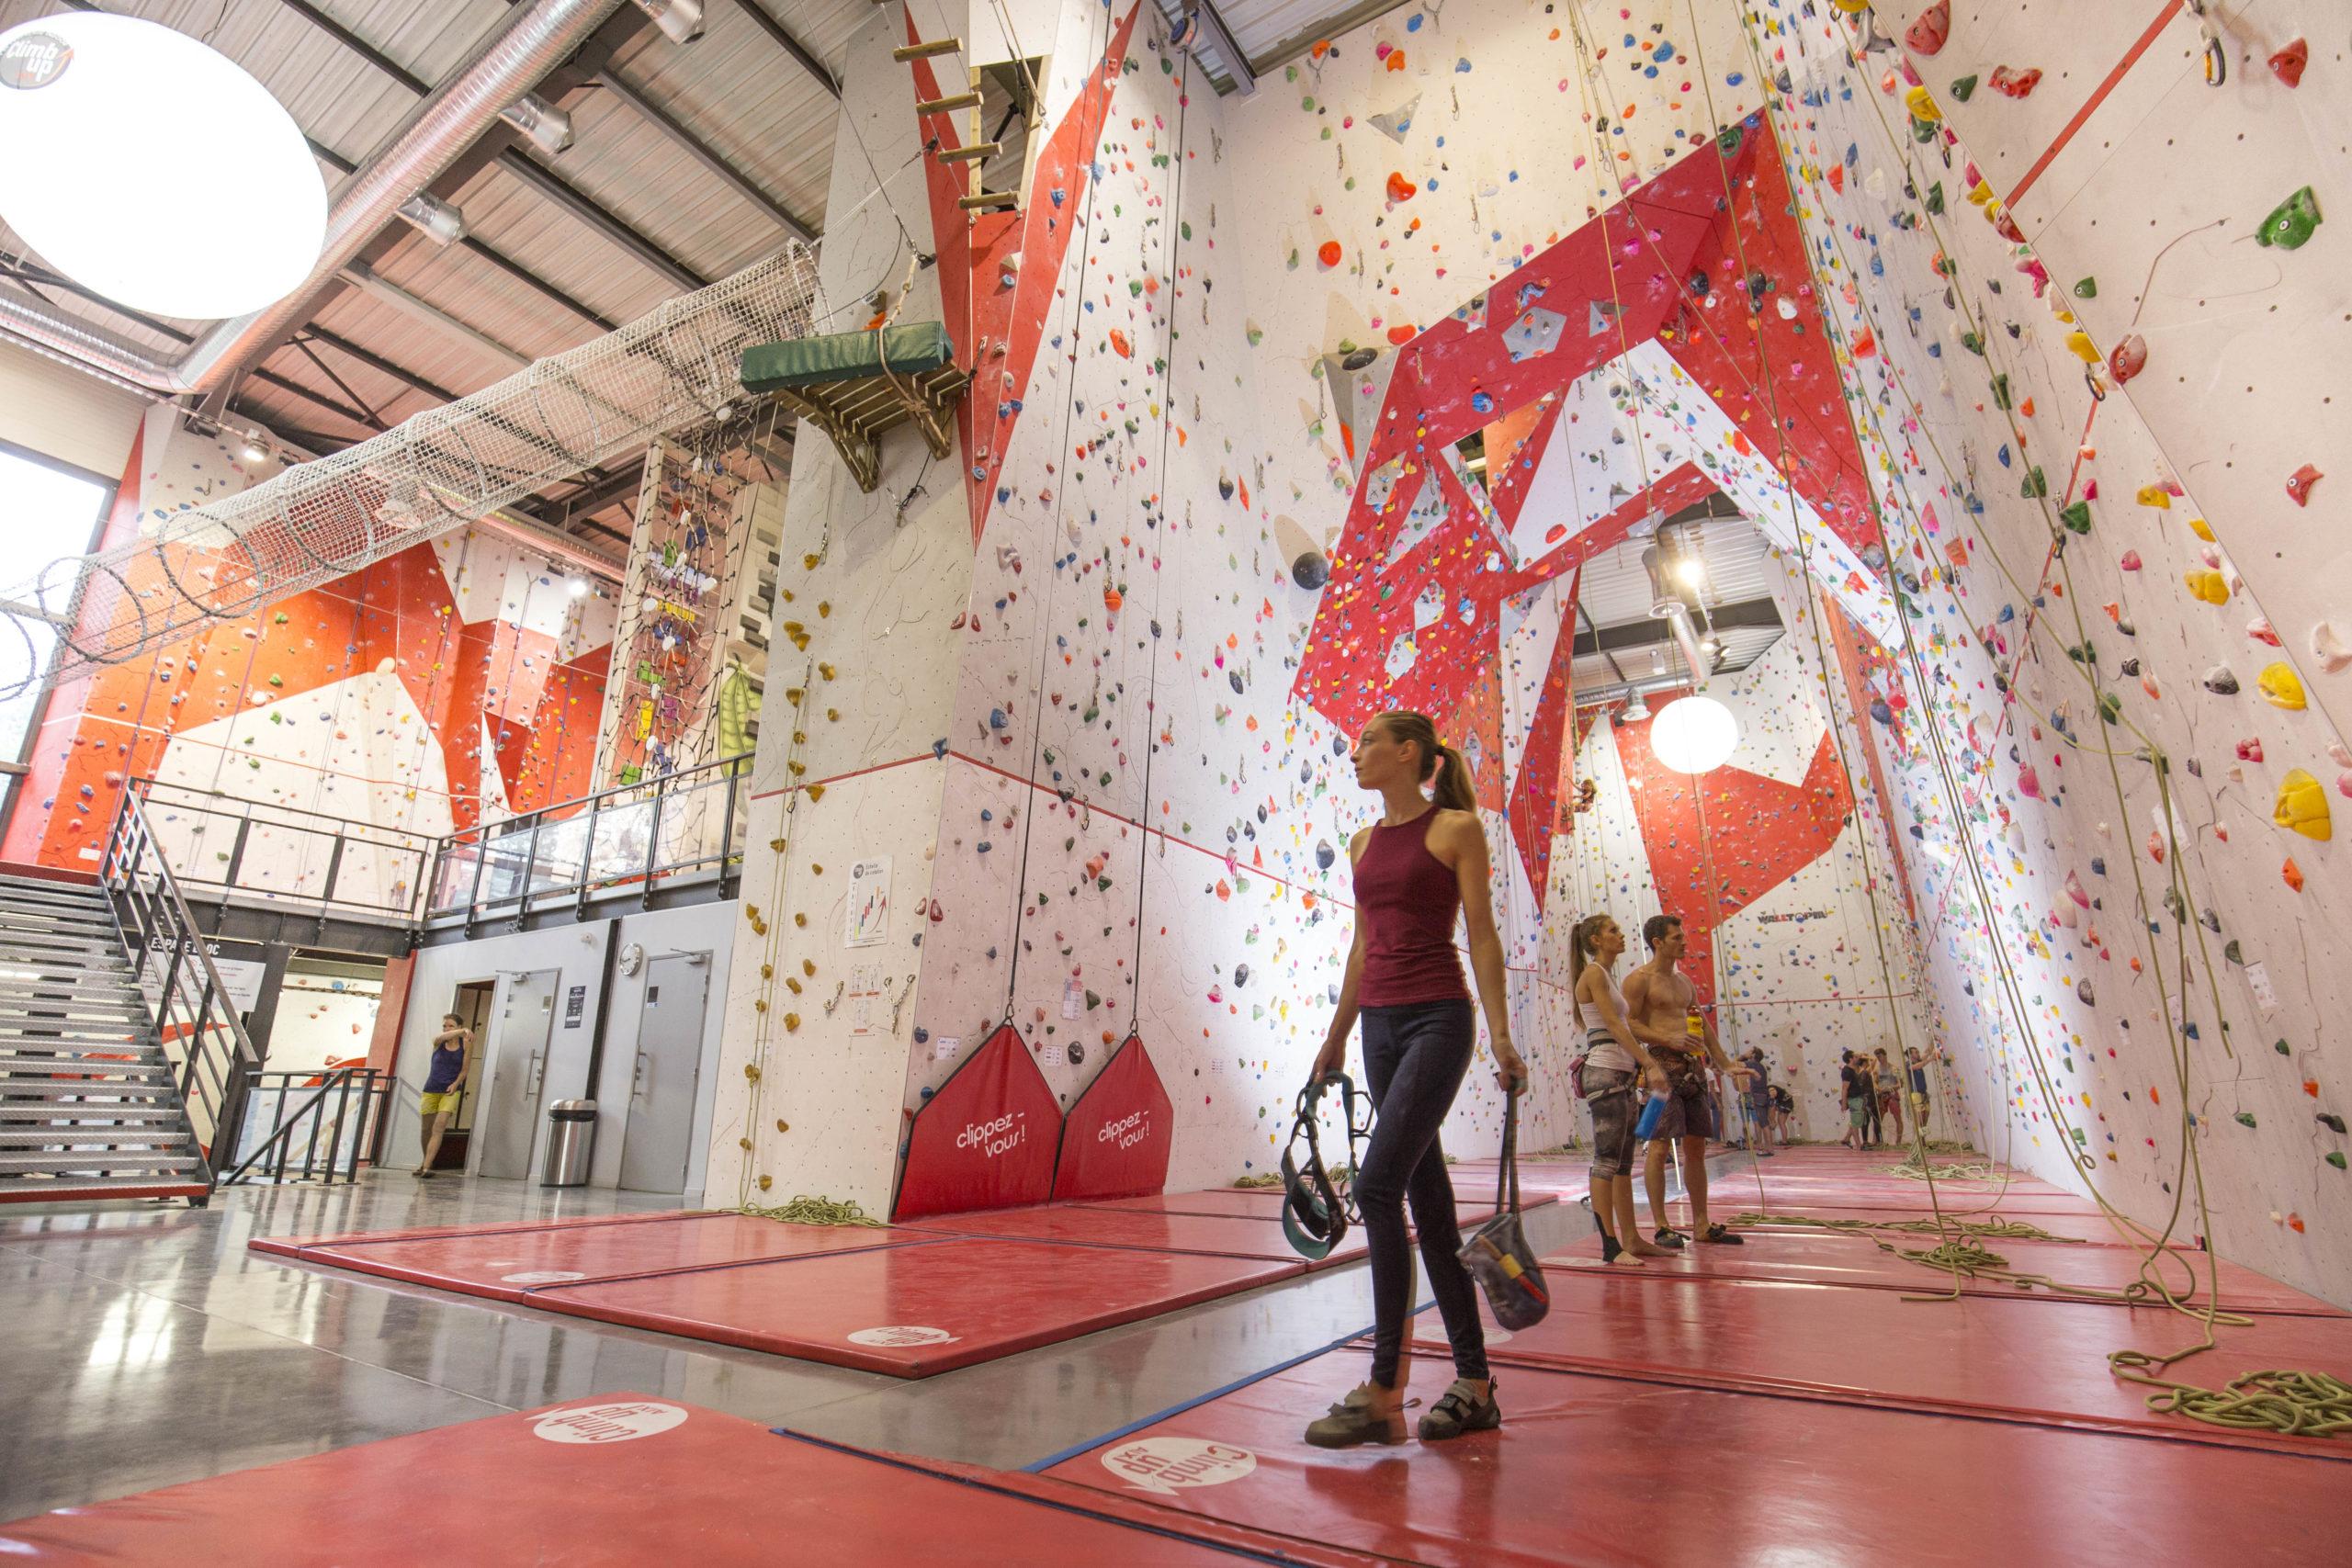 Salle de voies à Climb Up Aix - Bouc Bel Air